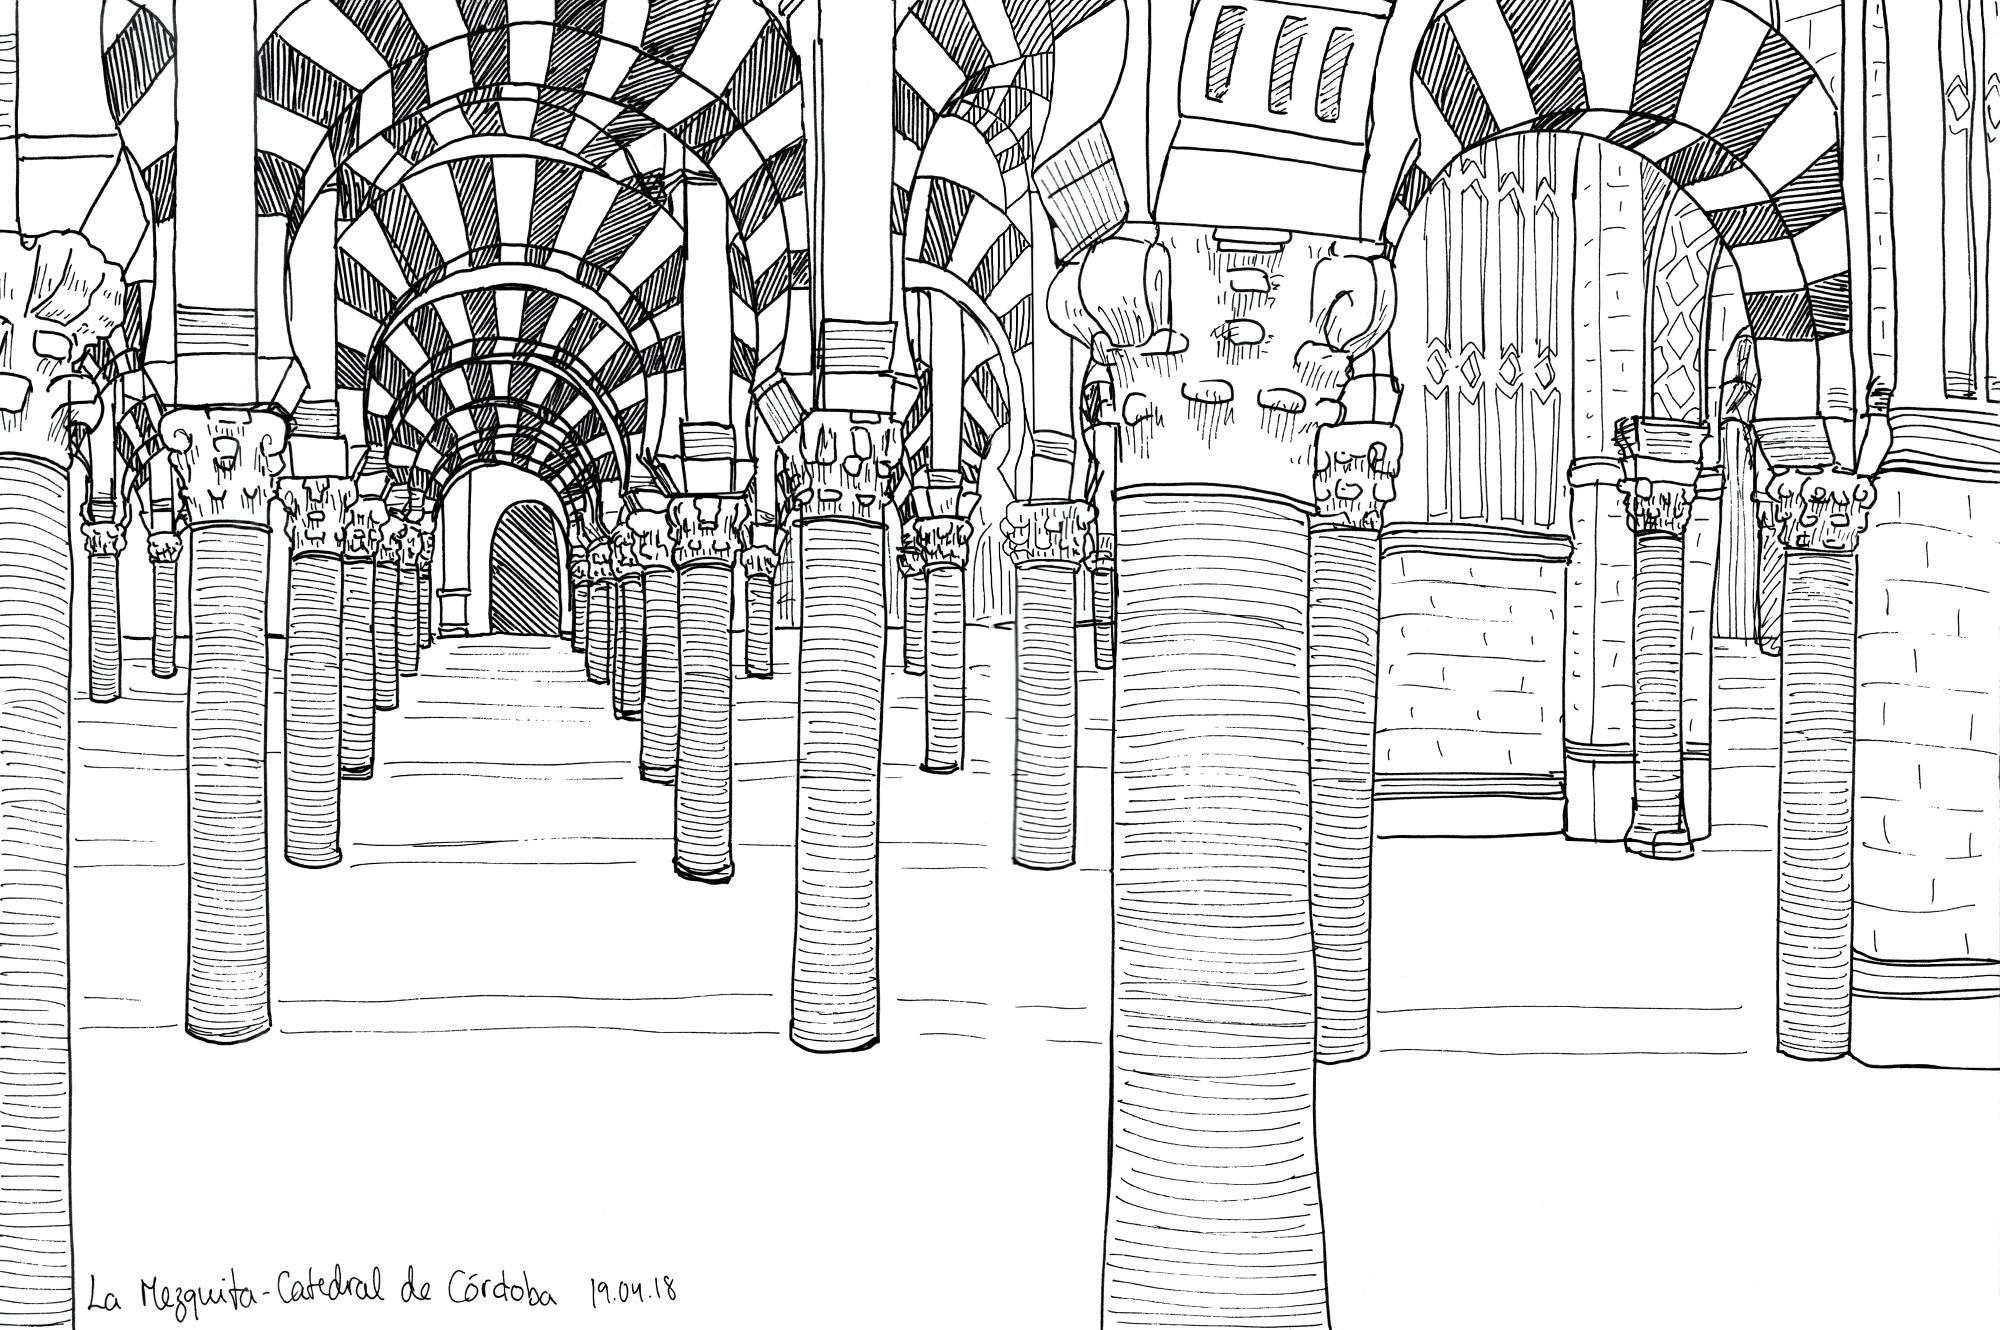 6_cordoba_mezquita_web.jpg